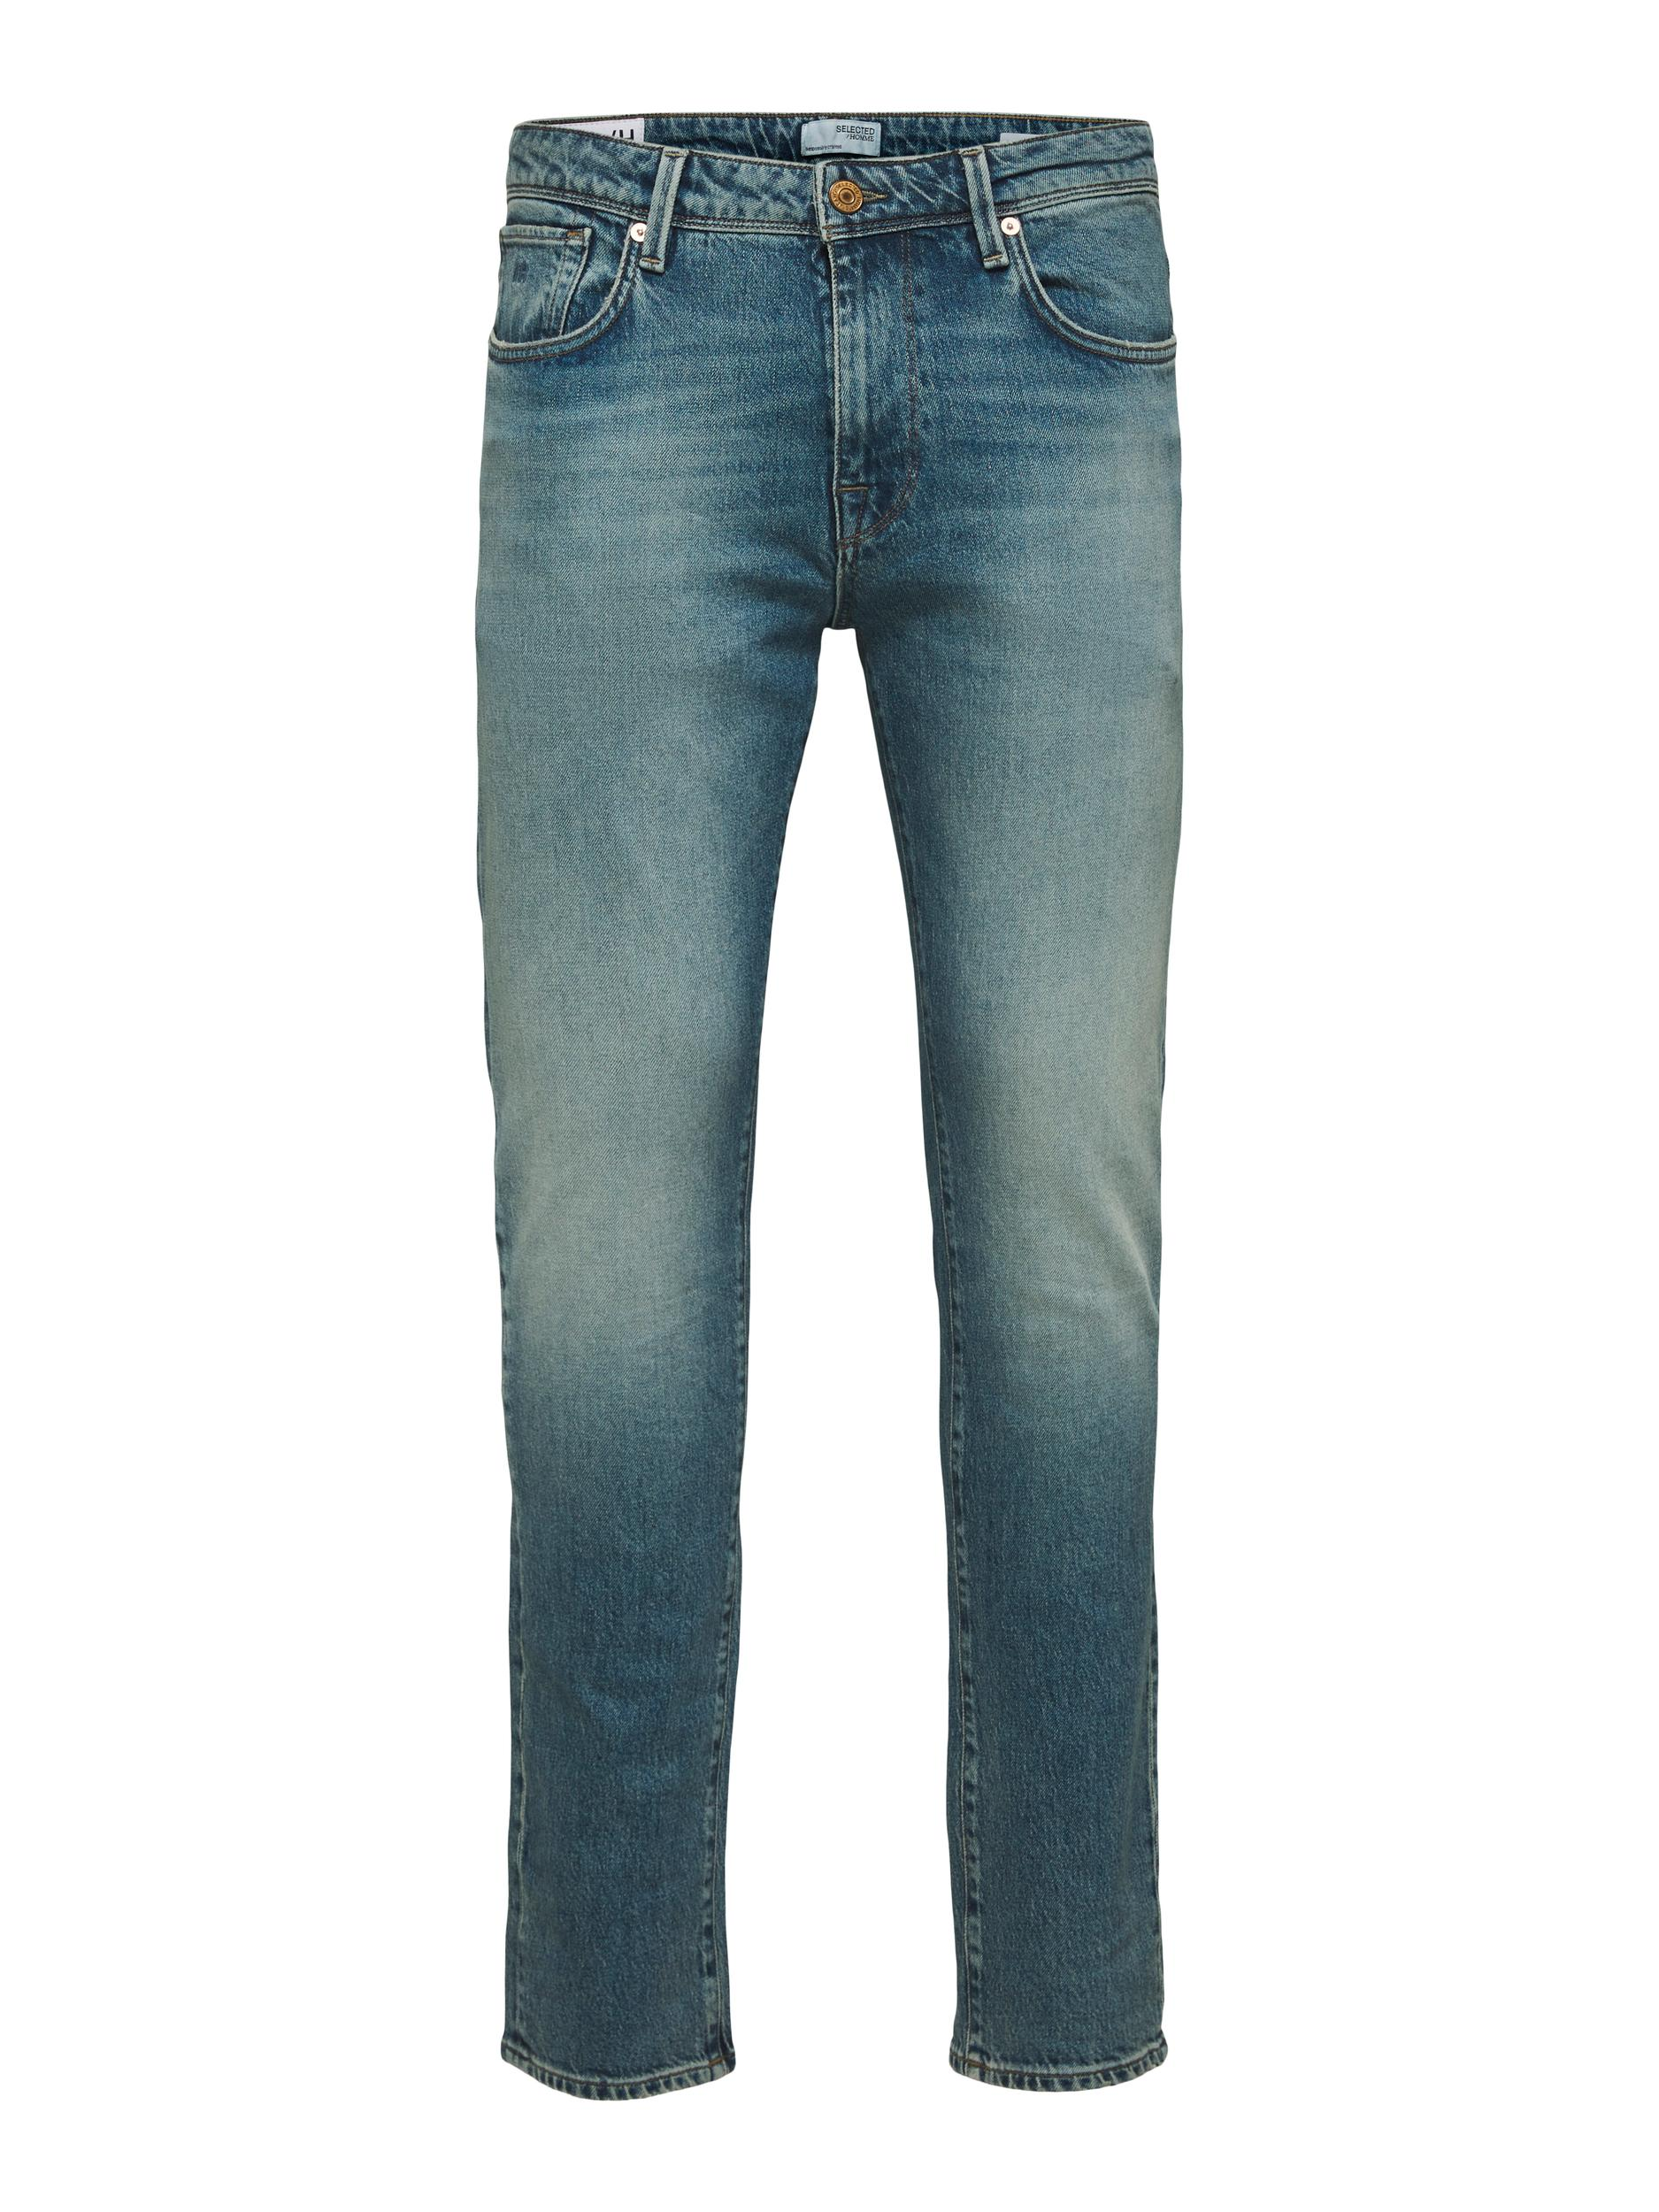 Selected Slim-Leon Jeans, Light Blue Denim, W33/L32